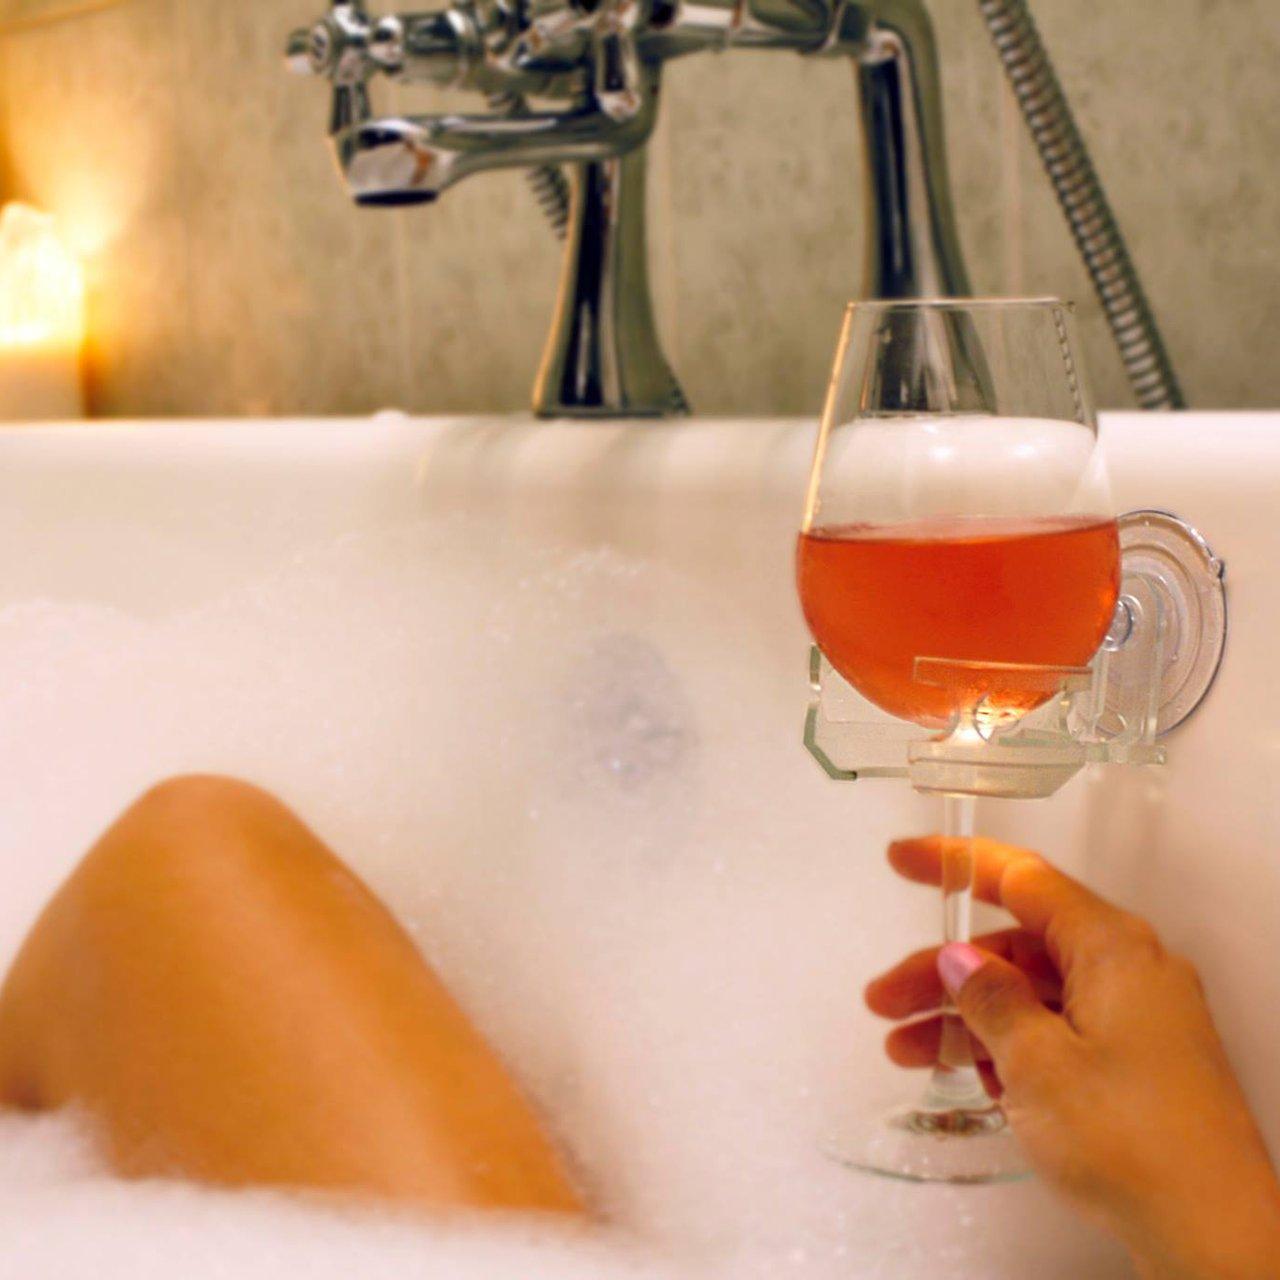 SipCaddy Bath & Shower Portable Cupholder Caddy